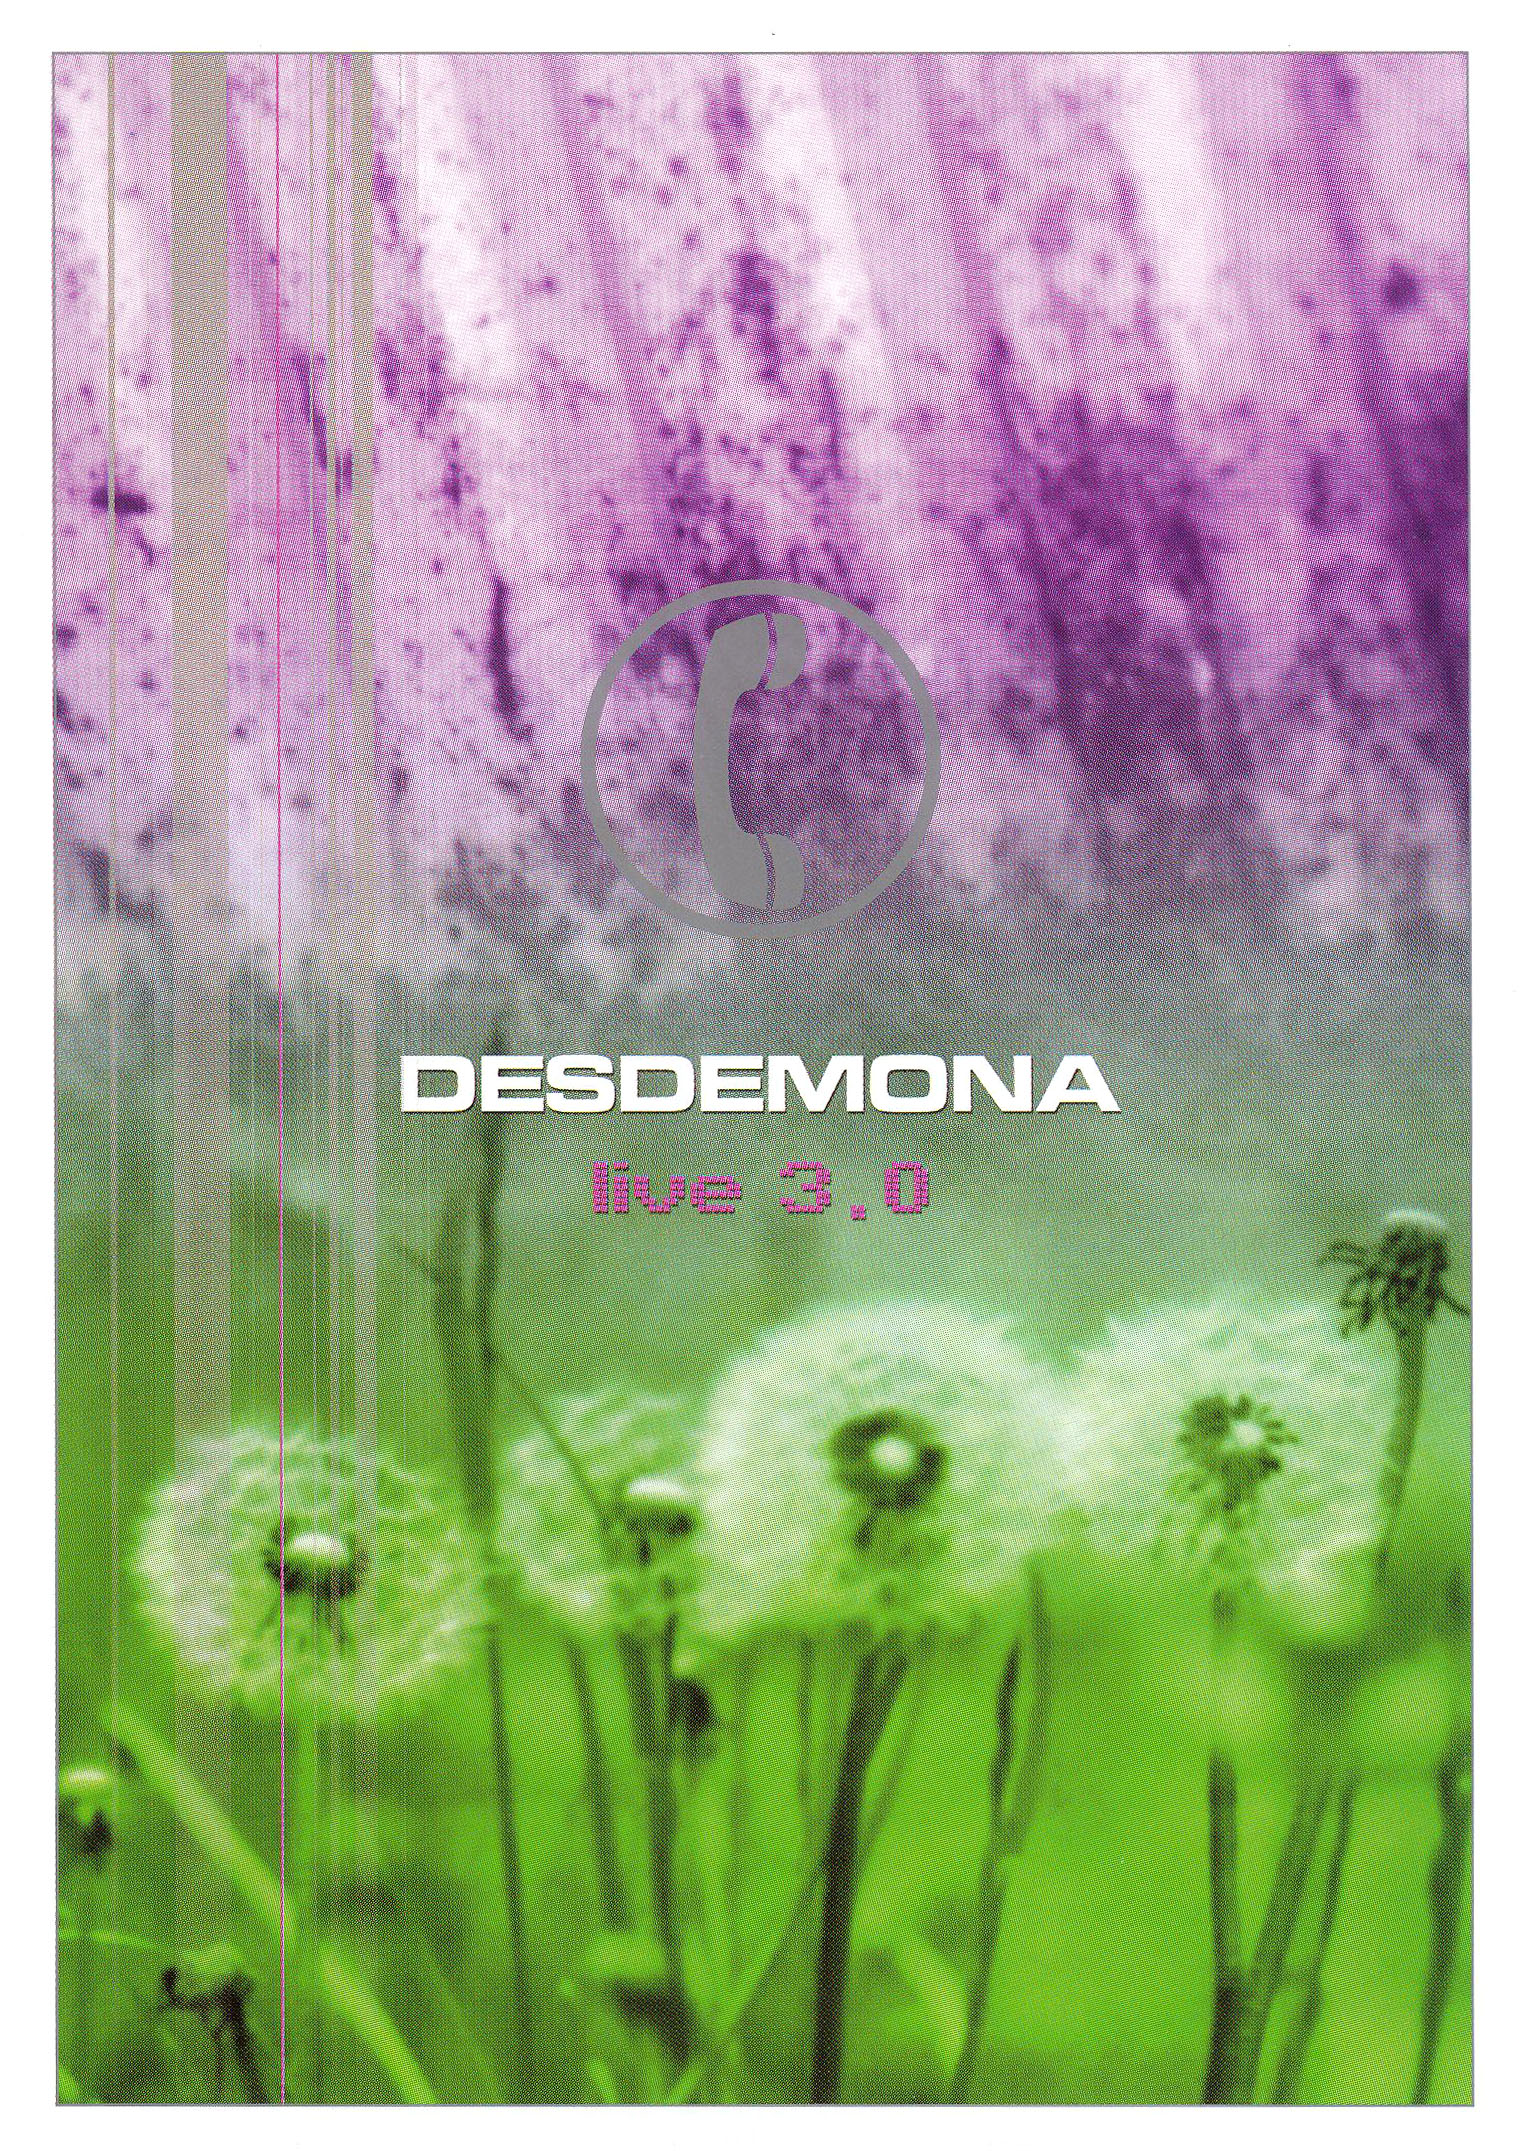 Desdemona: Live 3.0